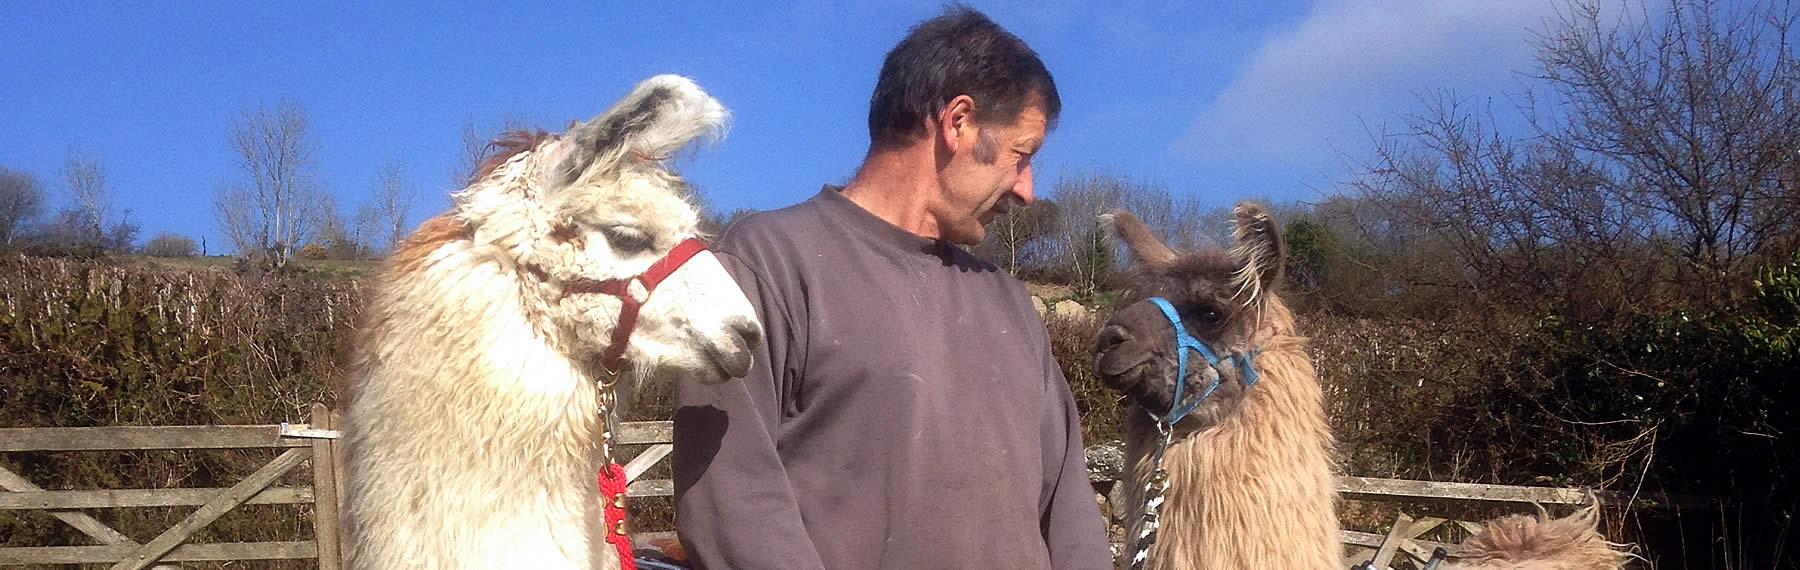 Newcott Farm Breeders of Llamas and Alpacas